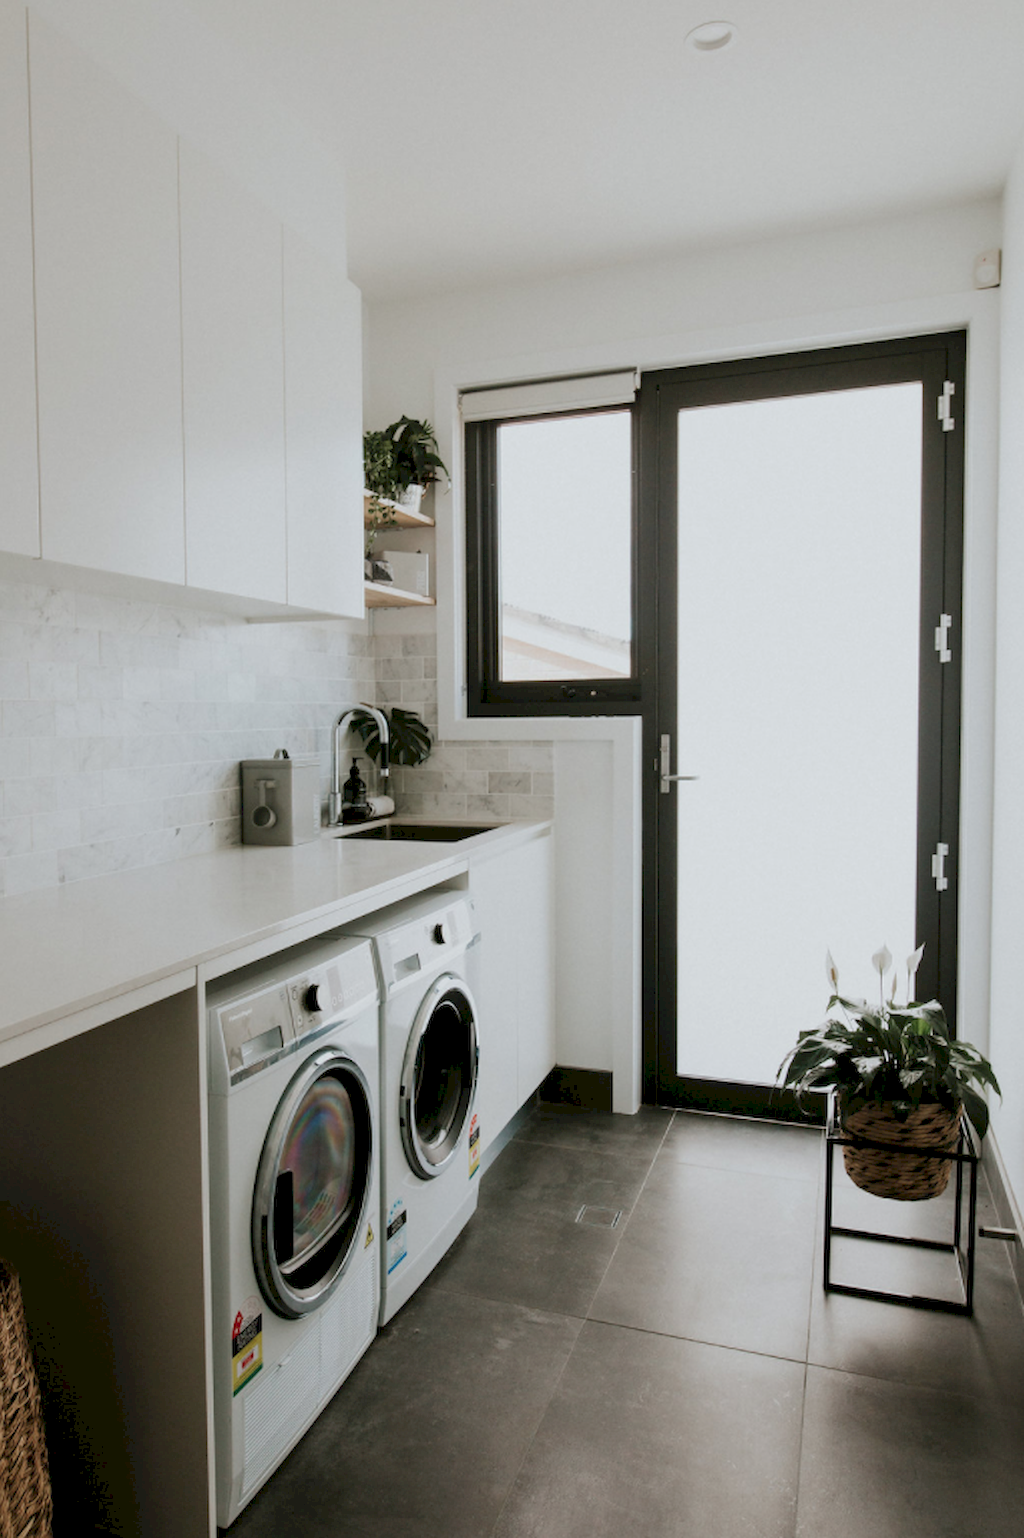 90 DIY Small Laundry Room Organization Ideas | Laundry ... on Small Laundry Room Organization Ideas  id=16806